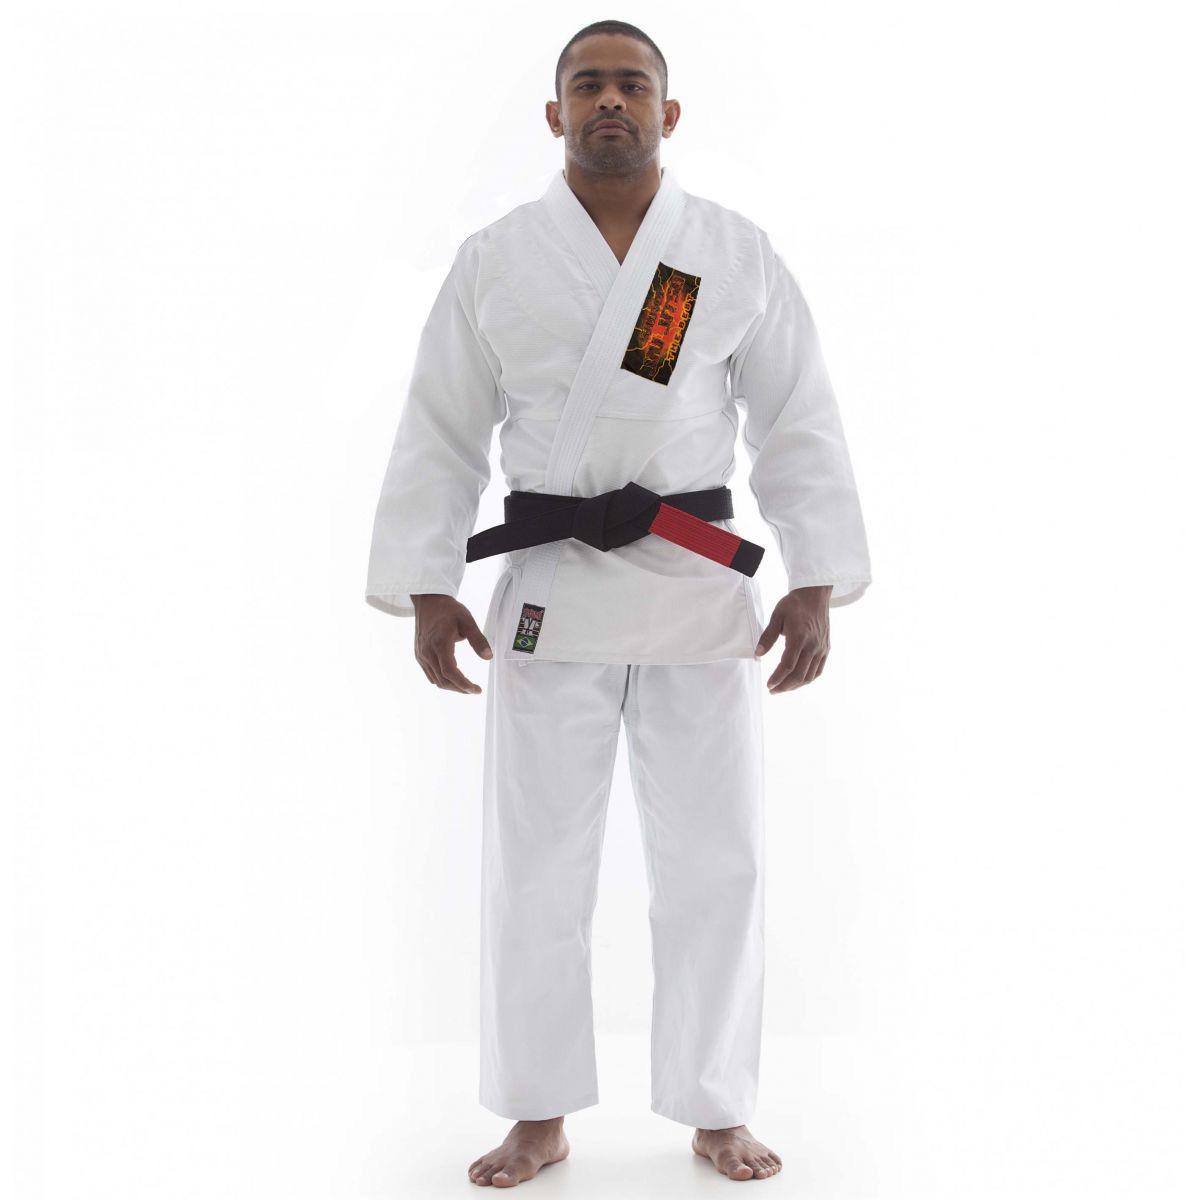 Kimono Jiu Jitsu - Trancado Master Competição - The Best - Shiroi - Branco